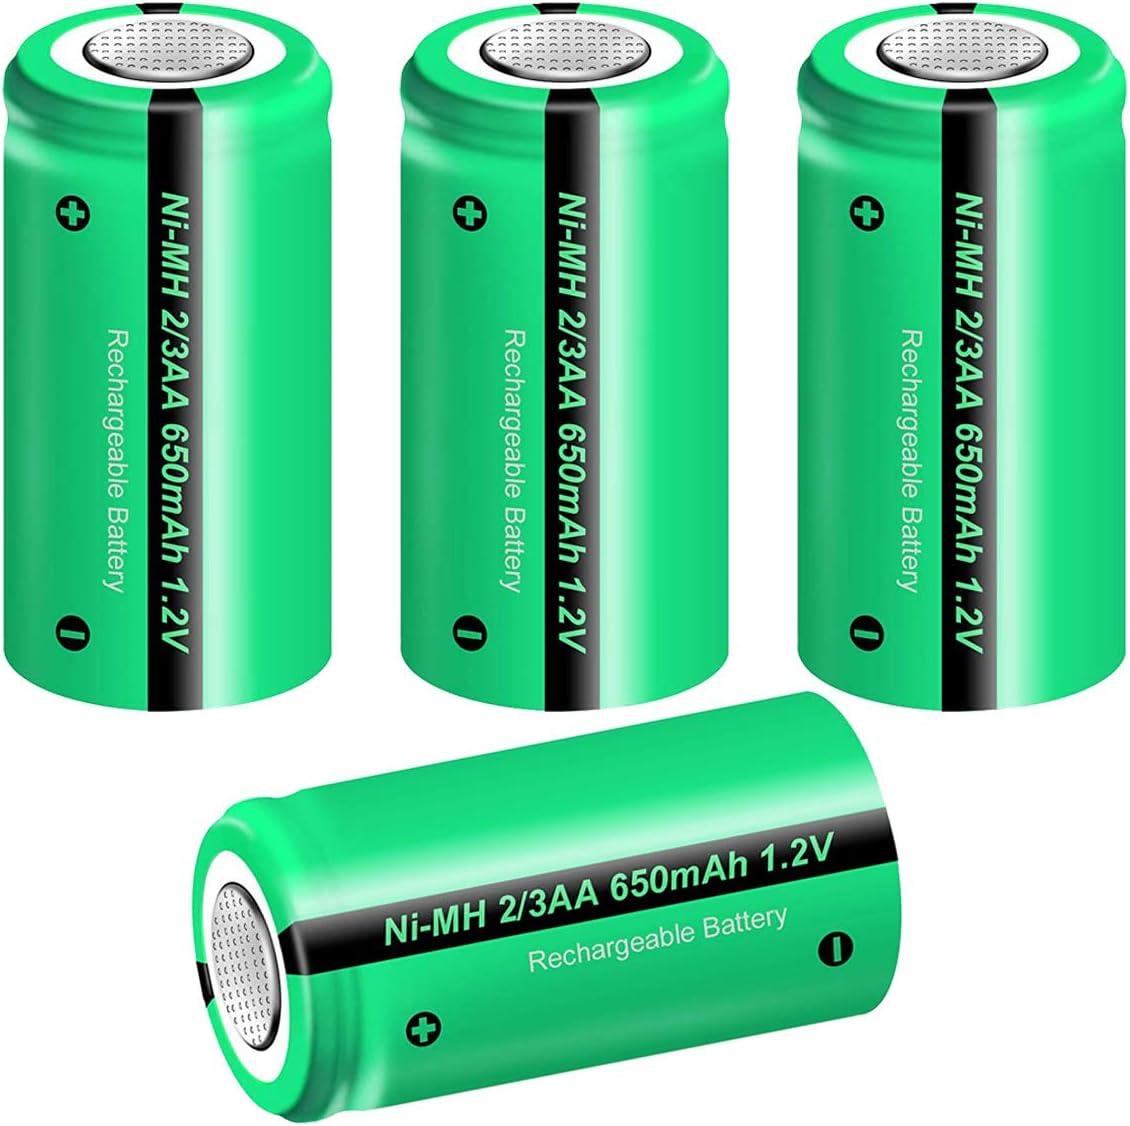 Batteria ricaricabile Ni-Mh 2//3AA 2//3 AA 1,2V 600mAh 14x29mm accumulatore per lampade pin piatto